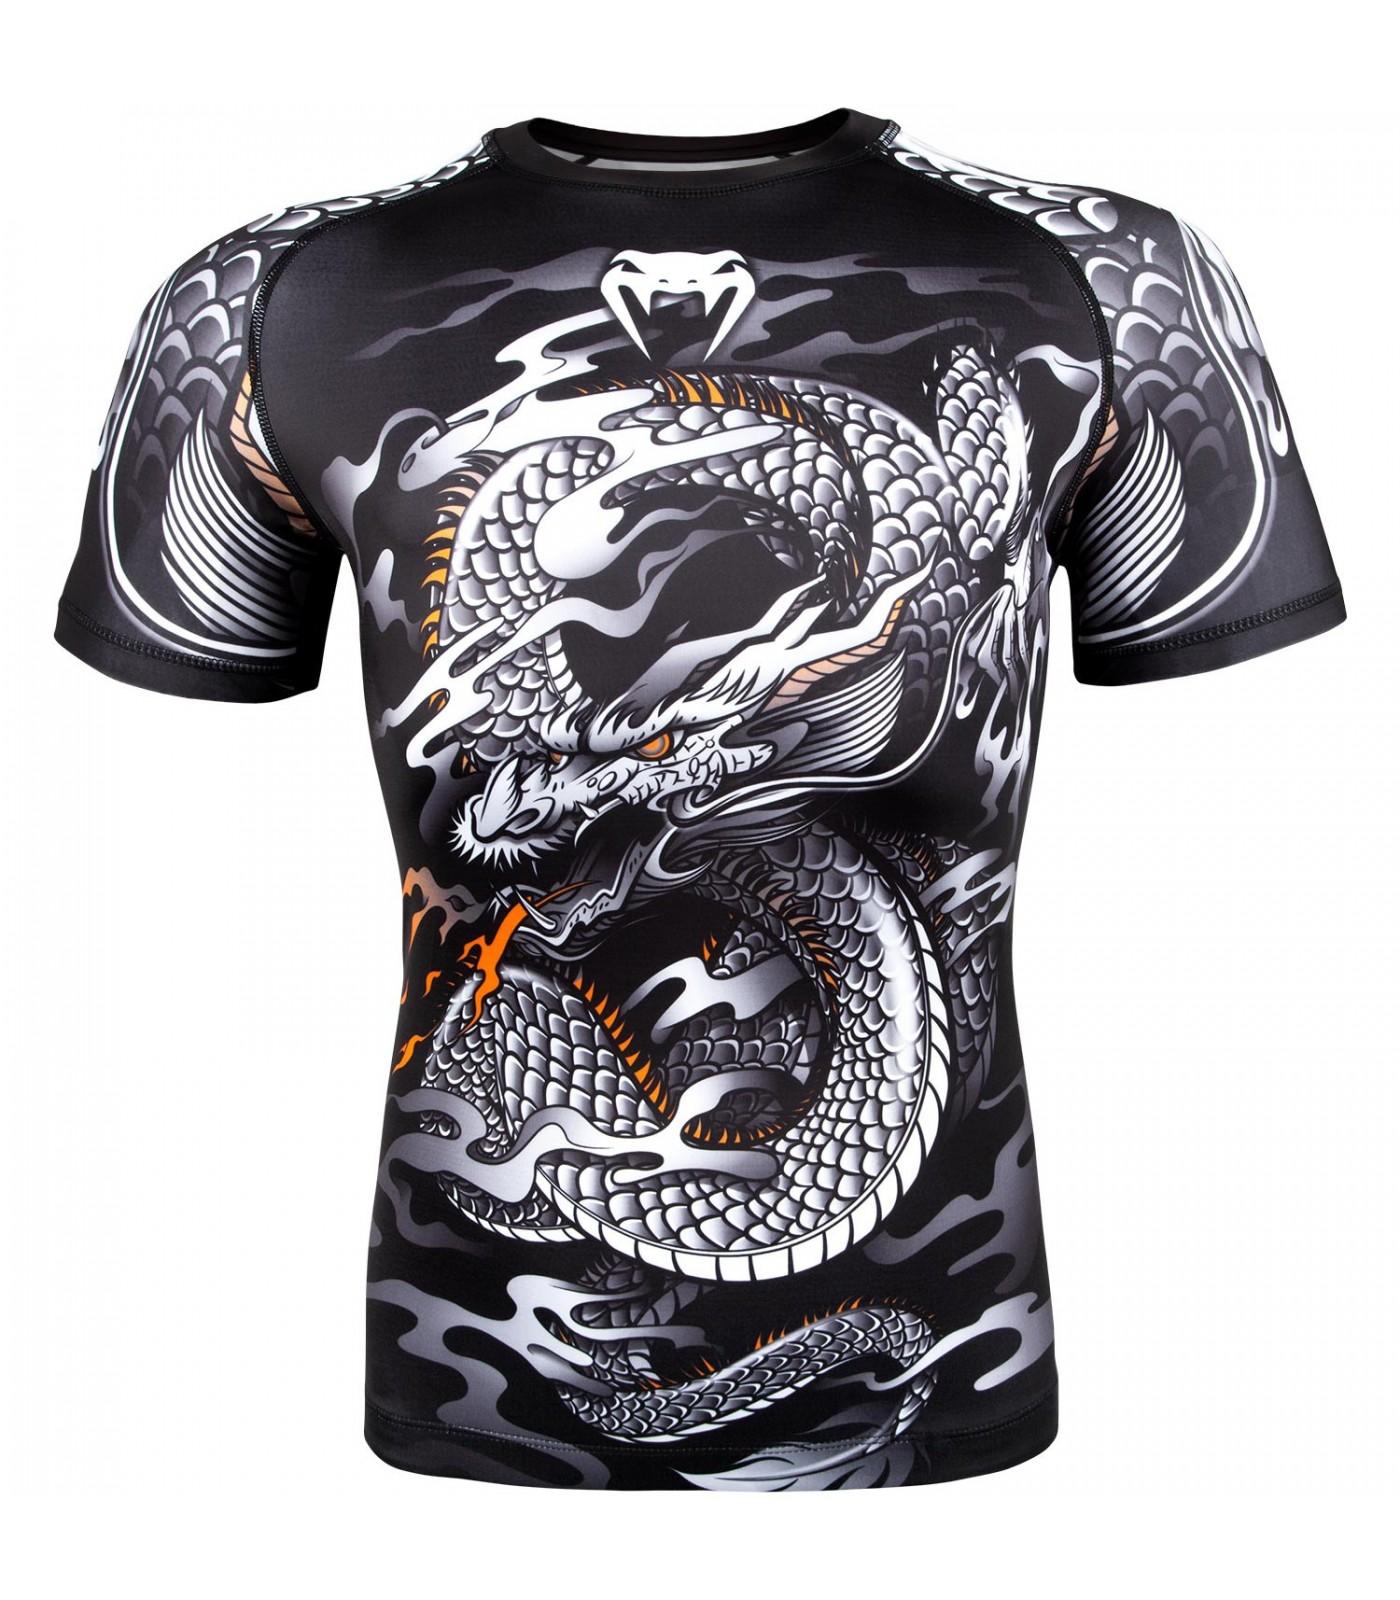 Рашгард - Venum Dragon's Flight Rashguard - Short Sleeves - Black/White